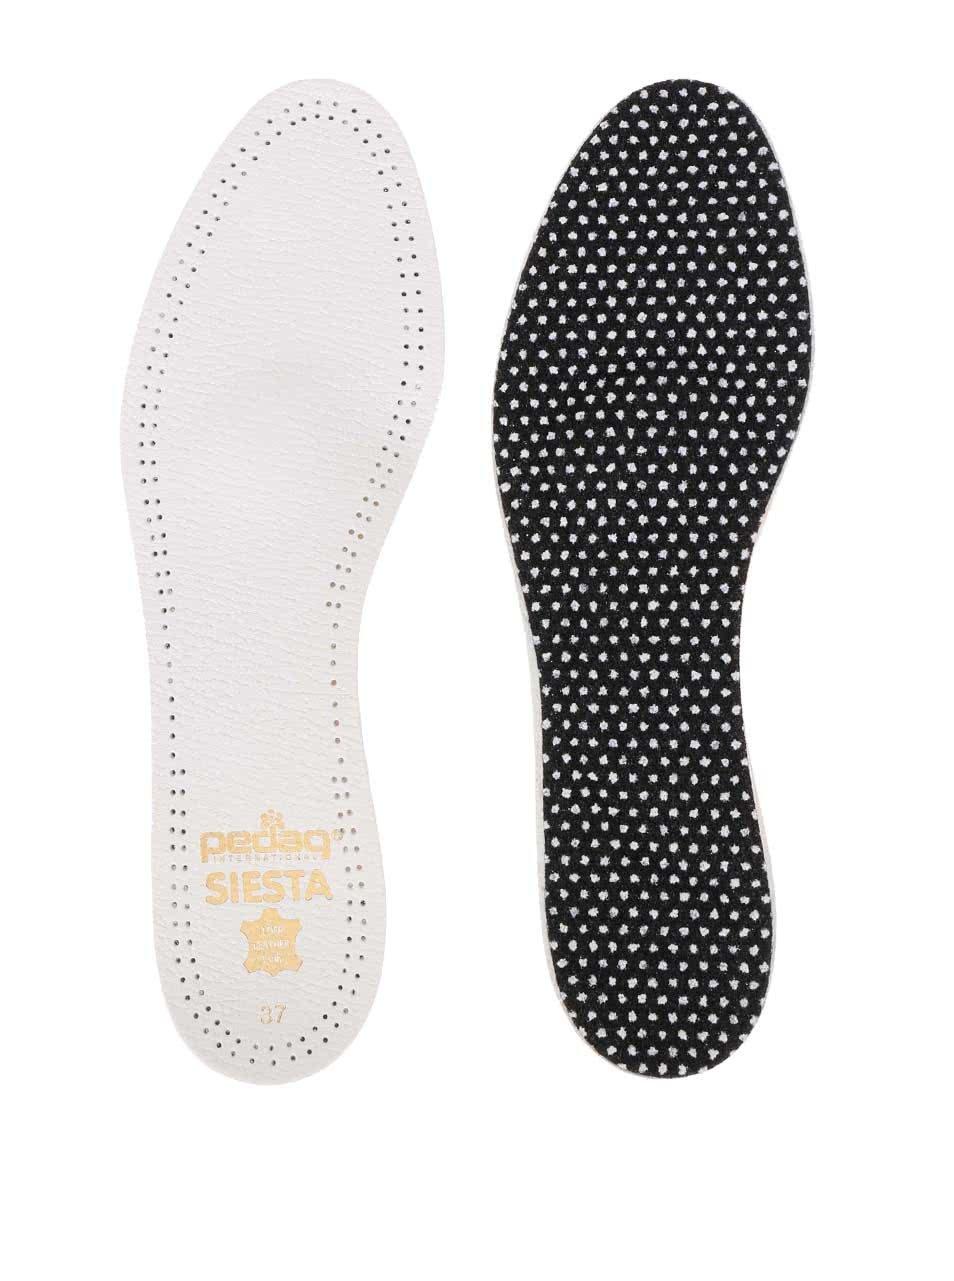 Dámské kožené vložky do bot pedag Siesta